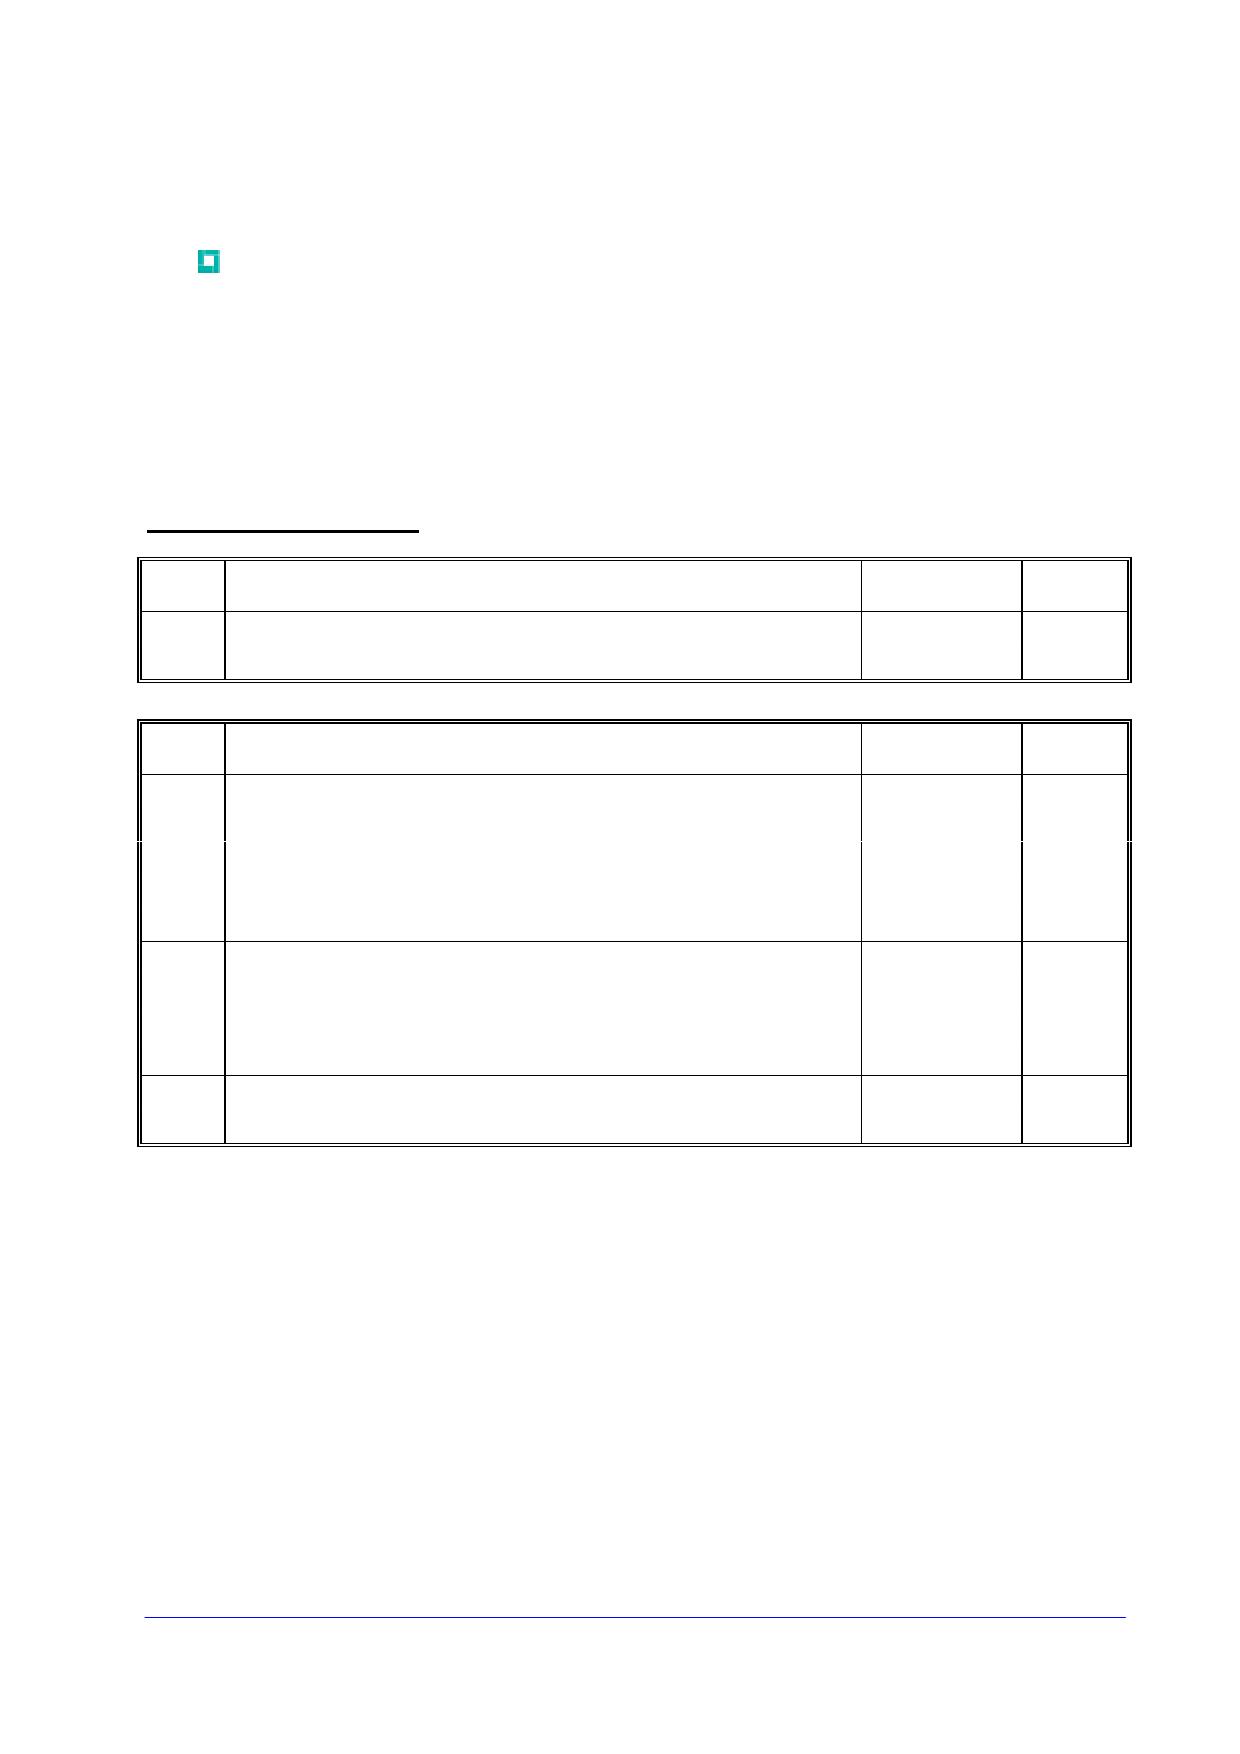 M0358WC160 دیتاشیت PDF